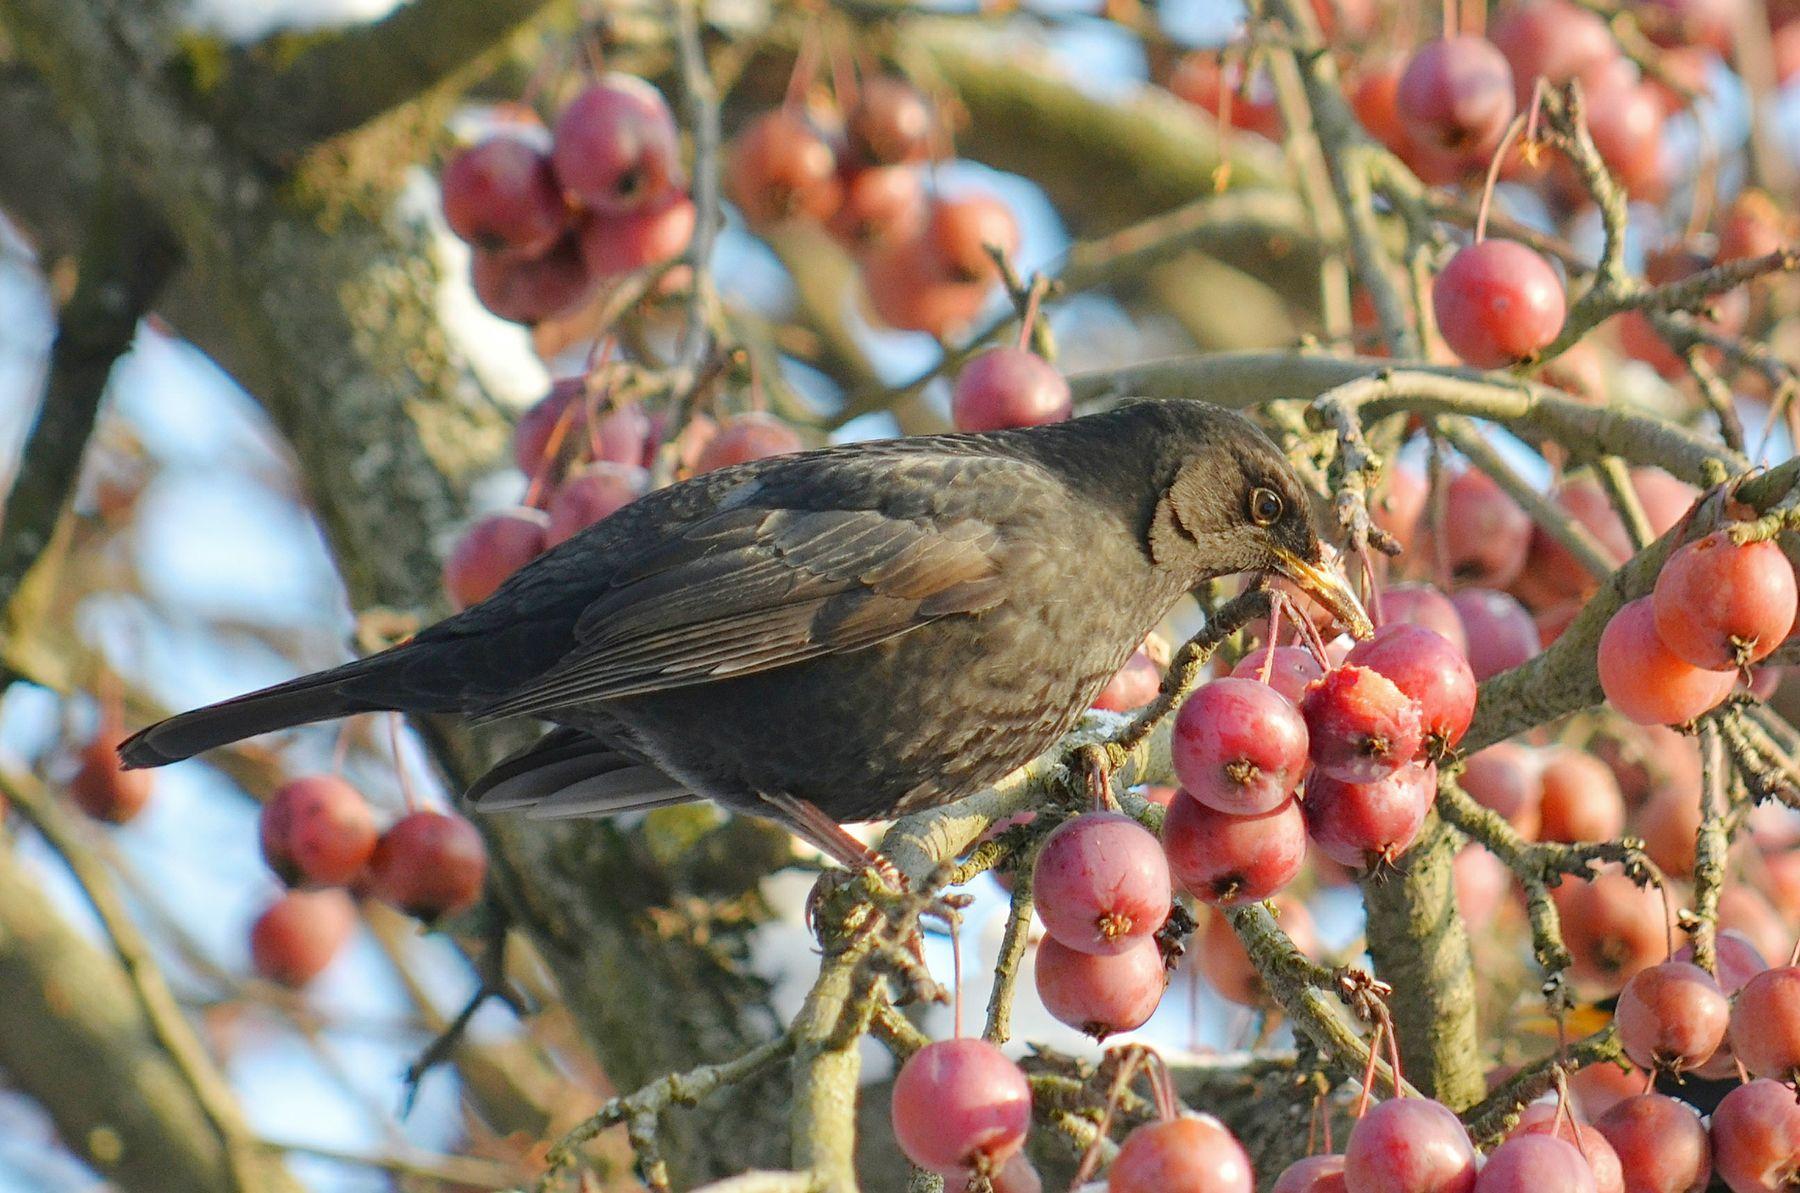 Съешь яблочко птица чёрный дрозд